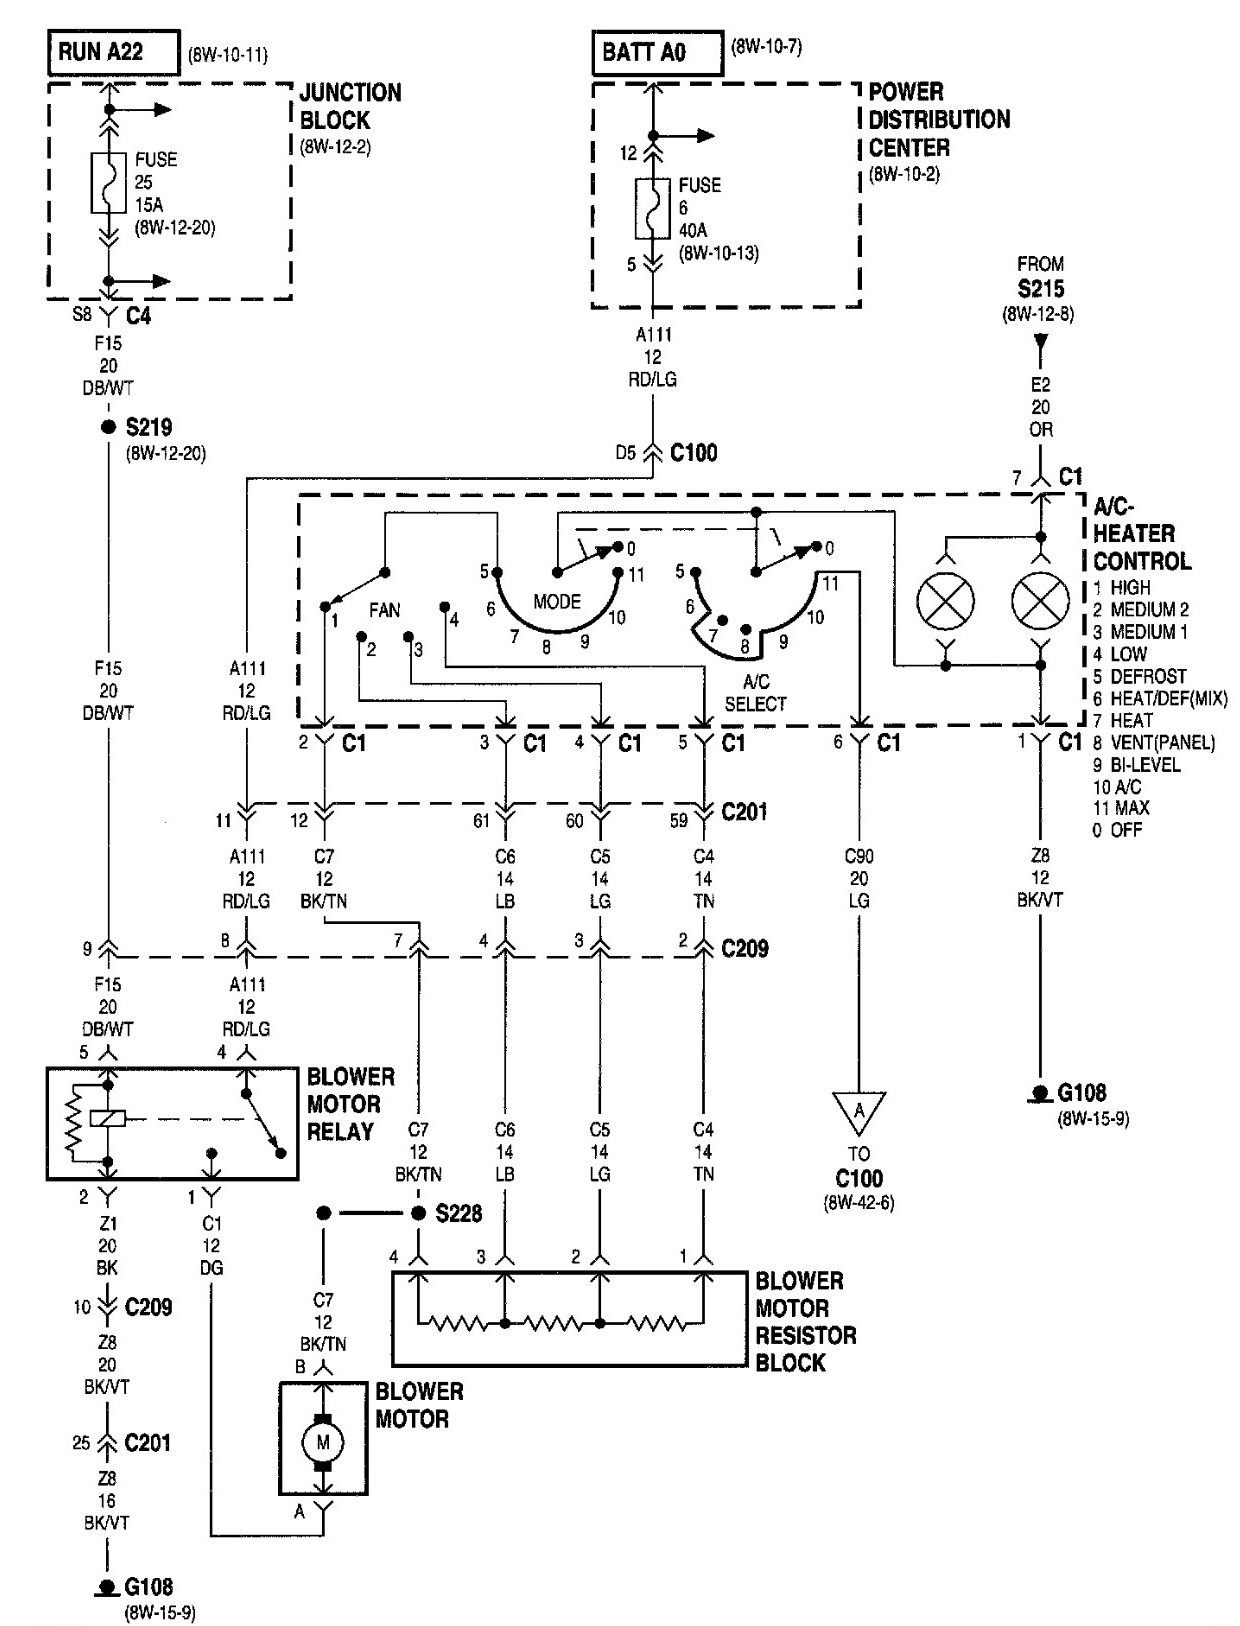 jeep wrangler fan diagram electrical work wiring diagram u2022 rh wiringdiagramshop today Air Conditioner Wiring Diagrams Blower Motor Switch Wiring